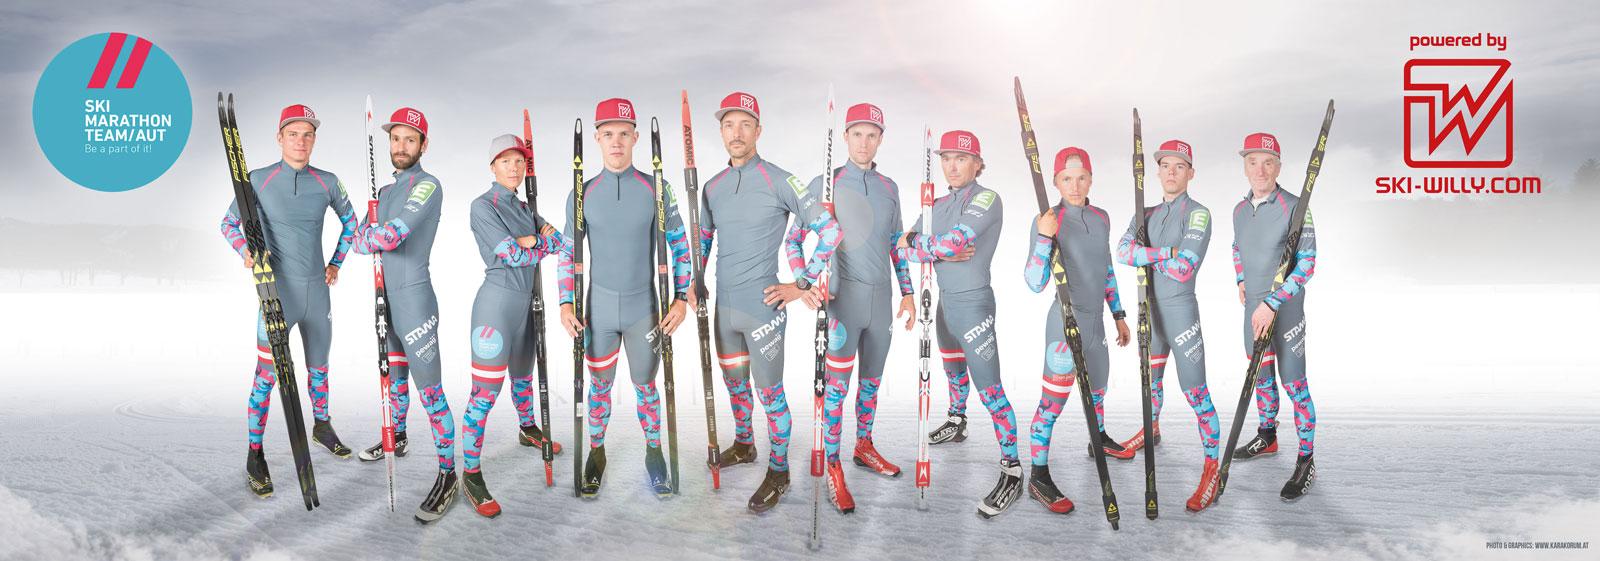 Ski Marathon Team Austria – Image Photographie